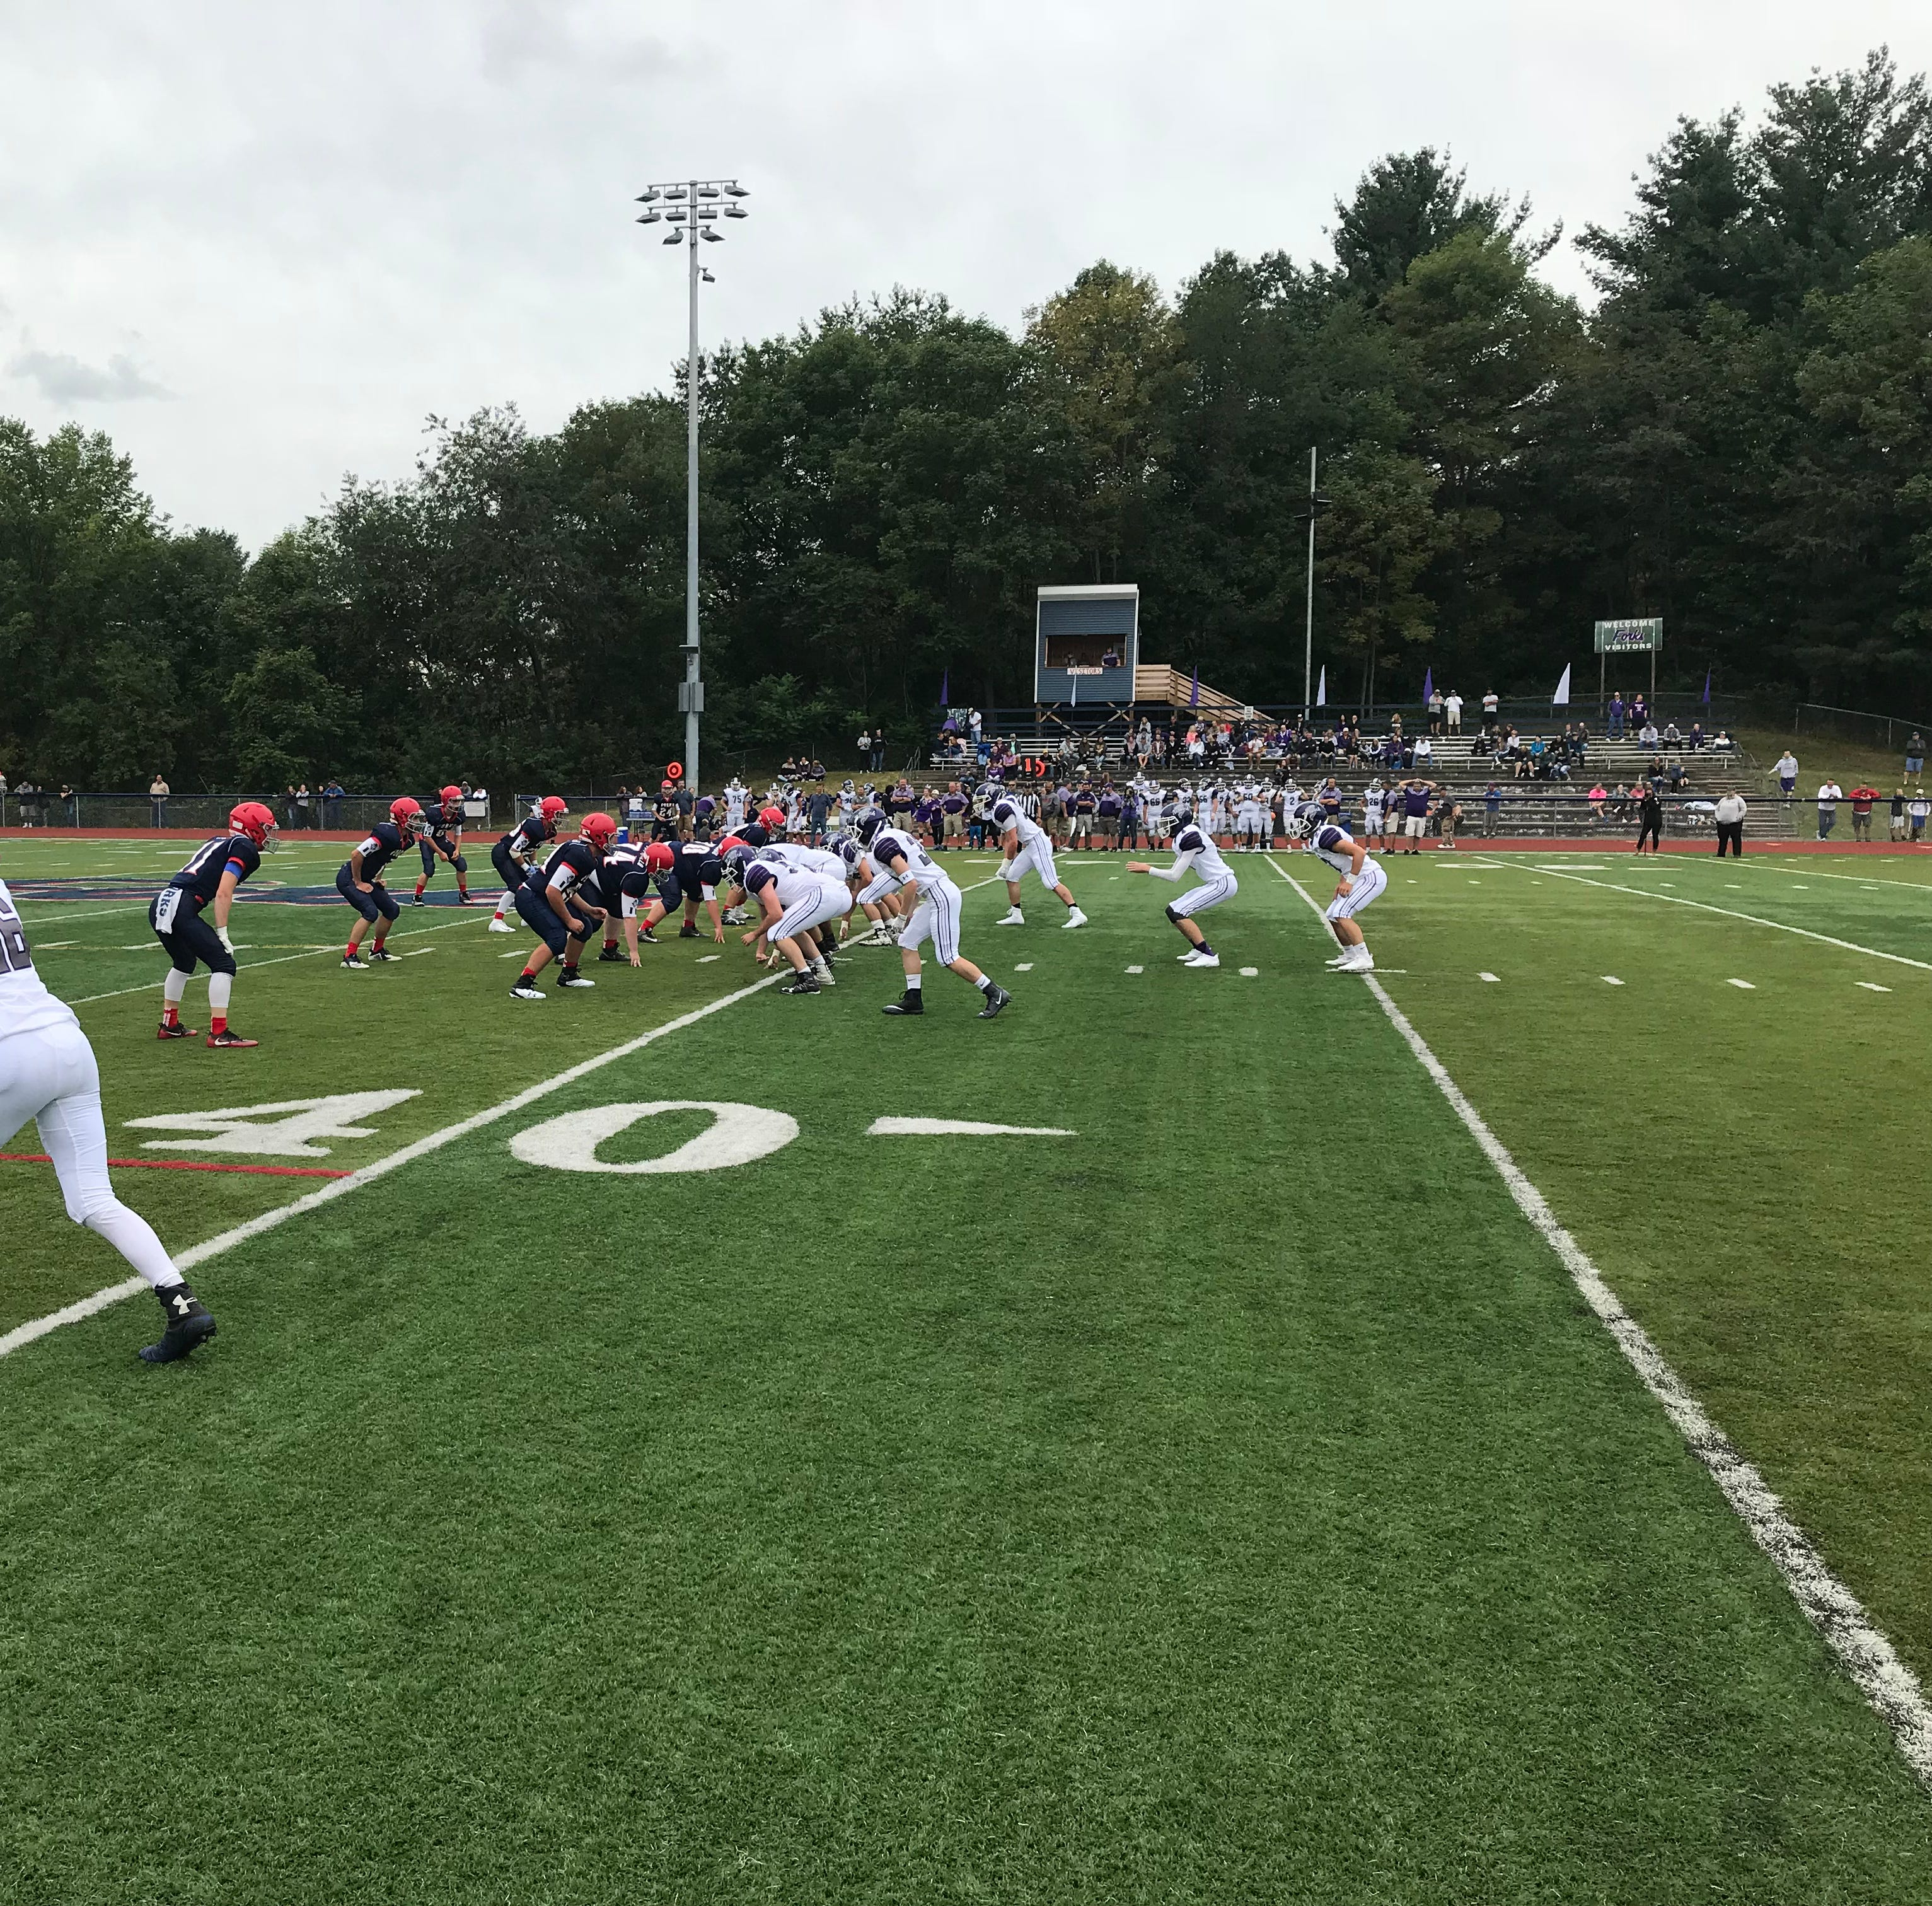 HS Football: CV vs. M-E, Forks vs. Owego top Week 3 menu